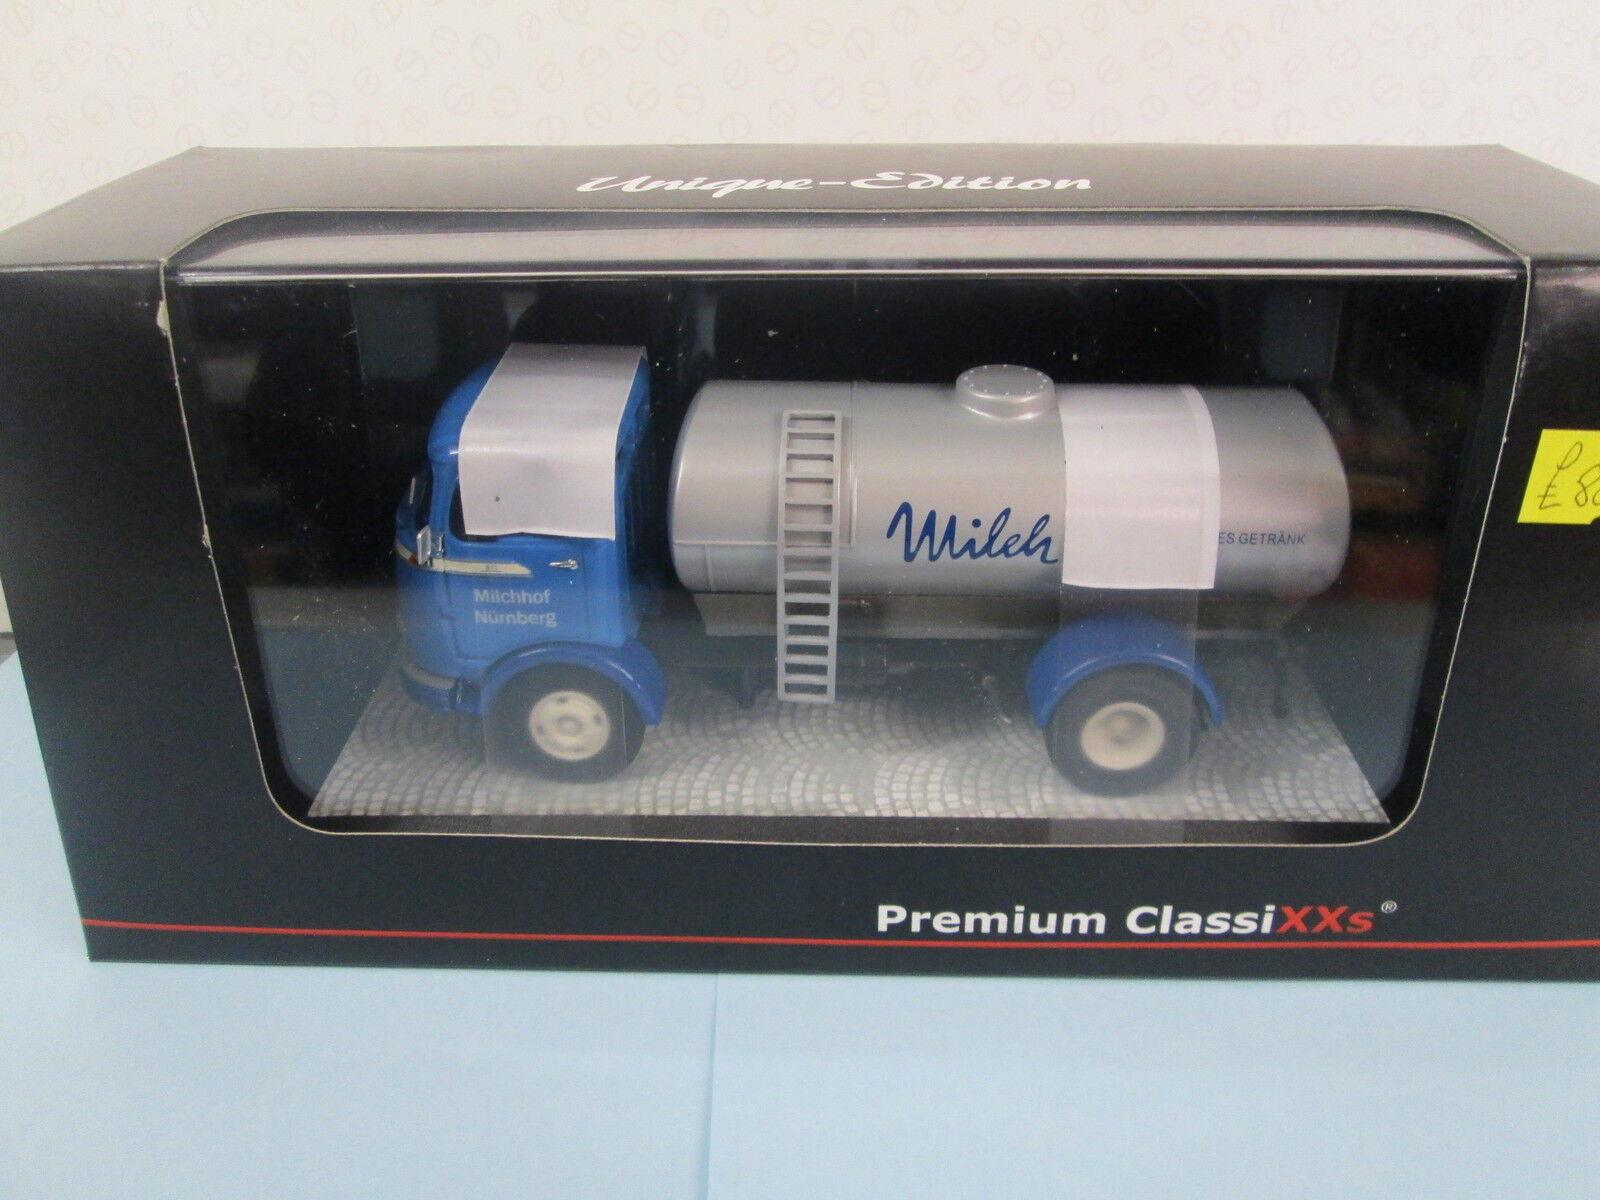 Premium Classixx. MERCEDES BENZ LP 911. Blu/Argento. latte petroliera. 1:43.18225.